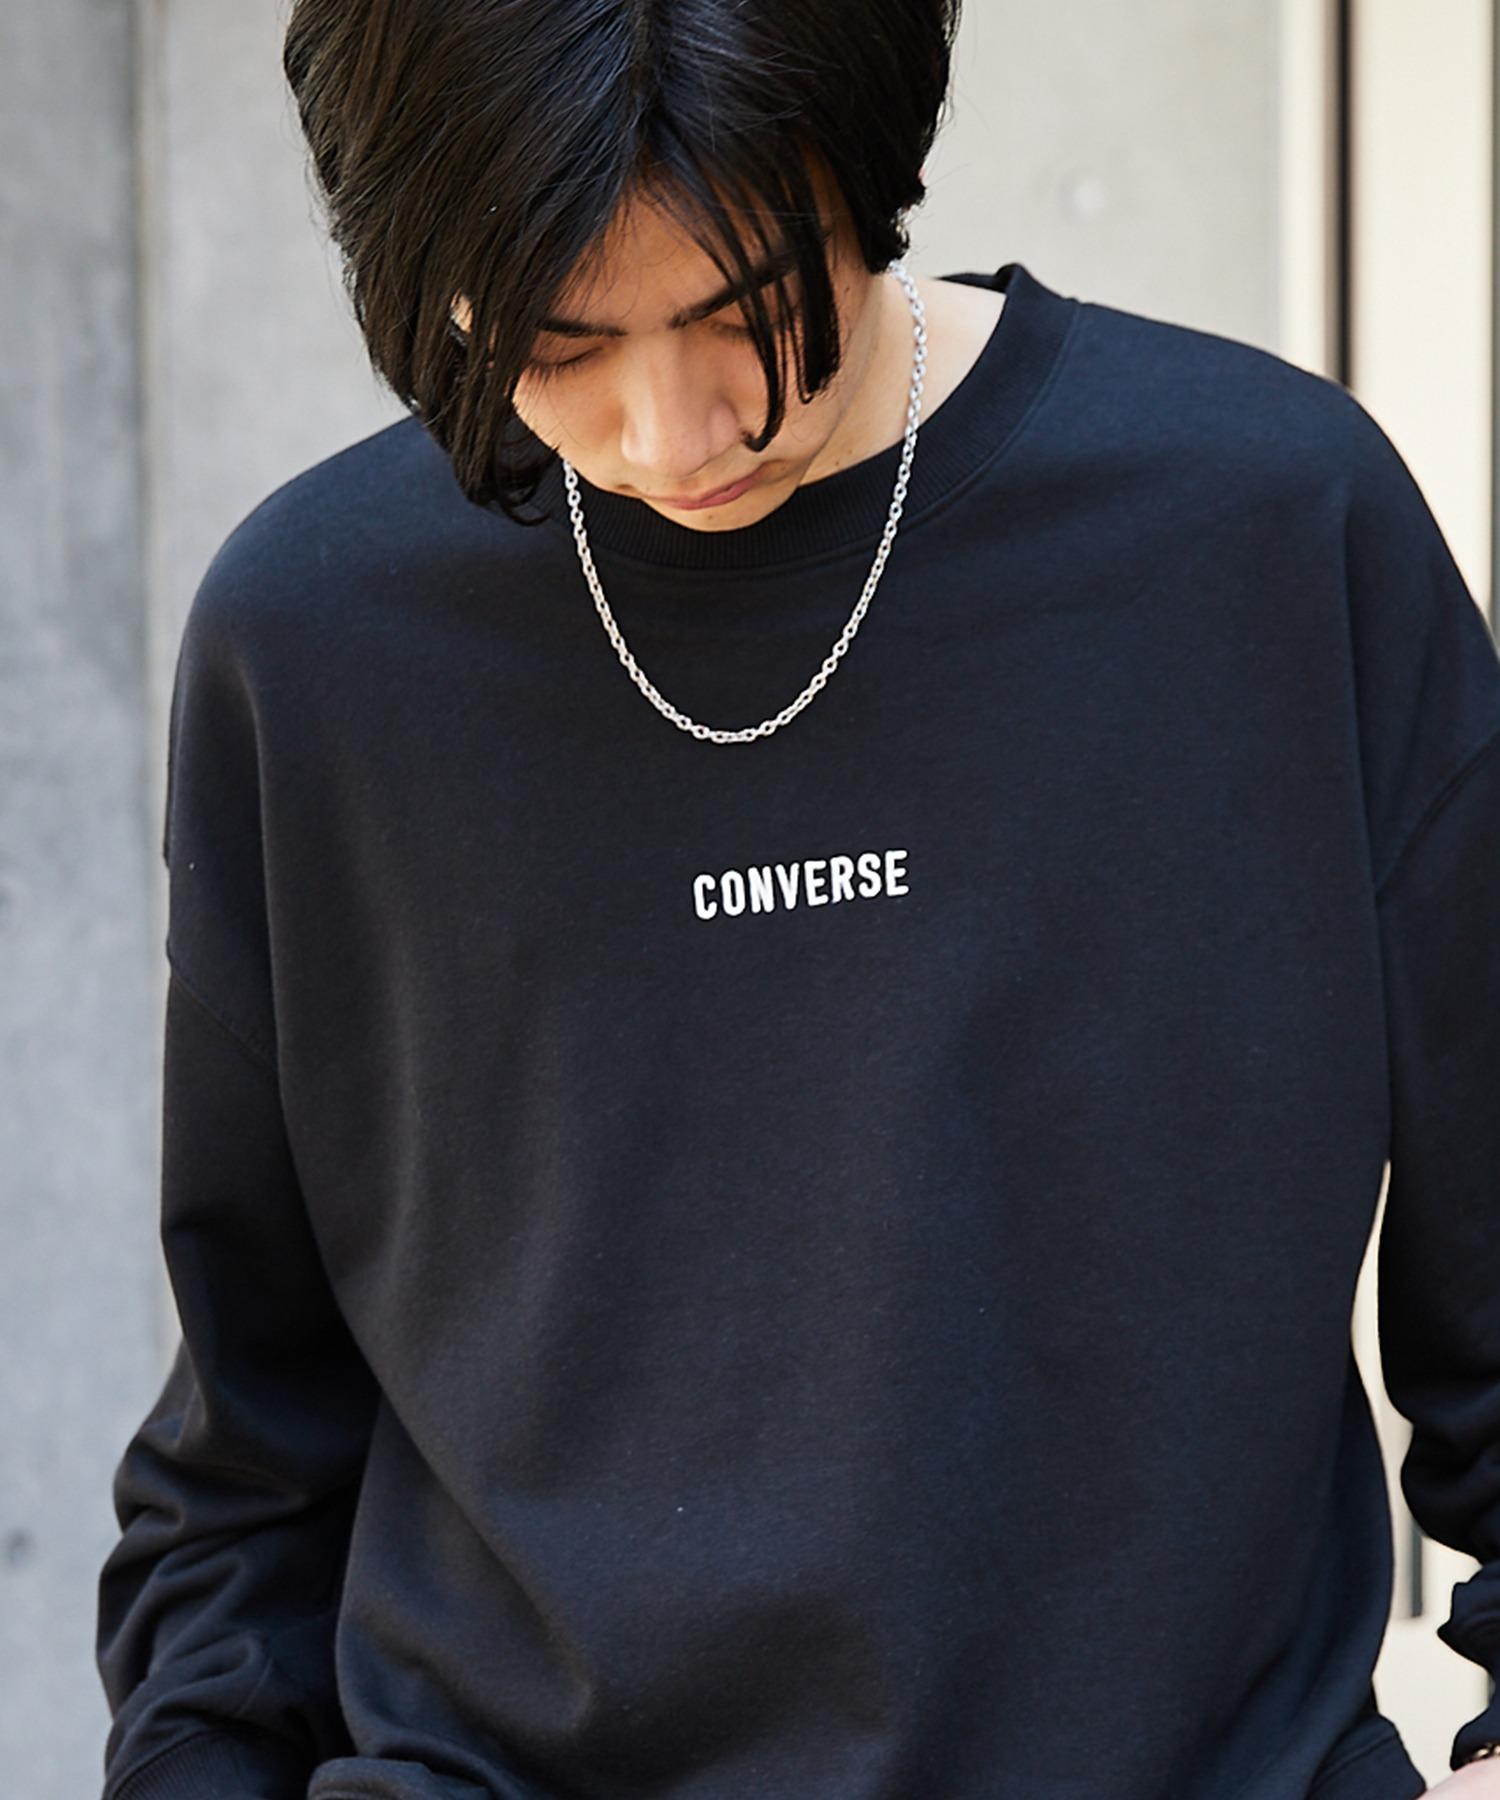 CONVERSE/コンバース 別注 フロント/袖刺繍 オーバーサイズプルオーバースウェット